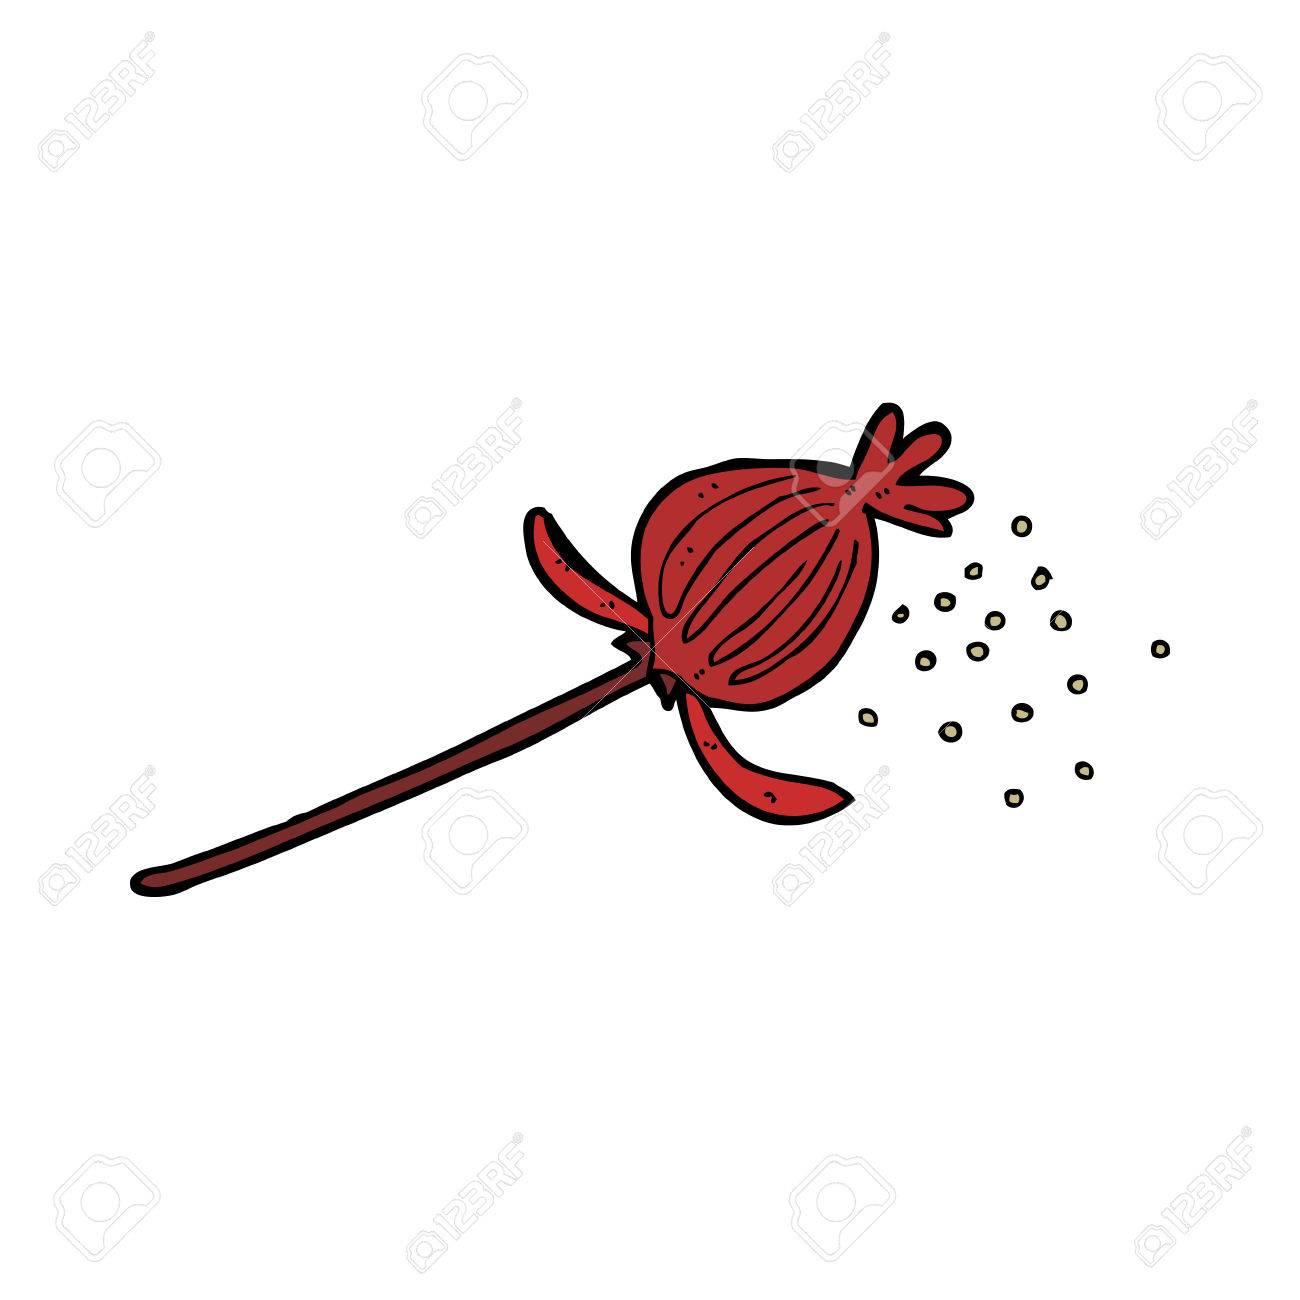 Cartoon dried poppy flower royalty free cliparts vectors and stock cartoon dried poppy flower stock vector 27860101 mightylinksfo